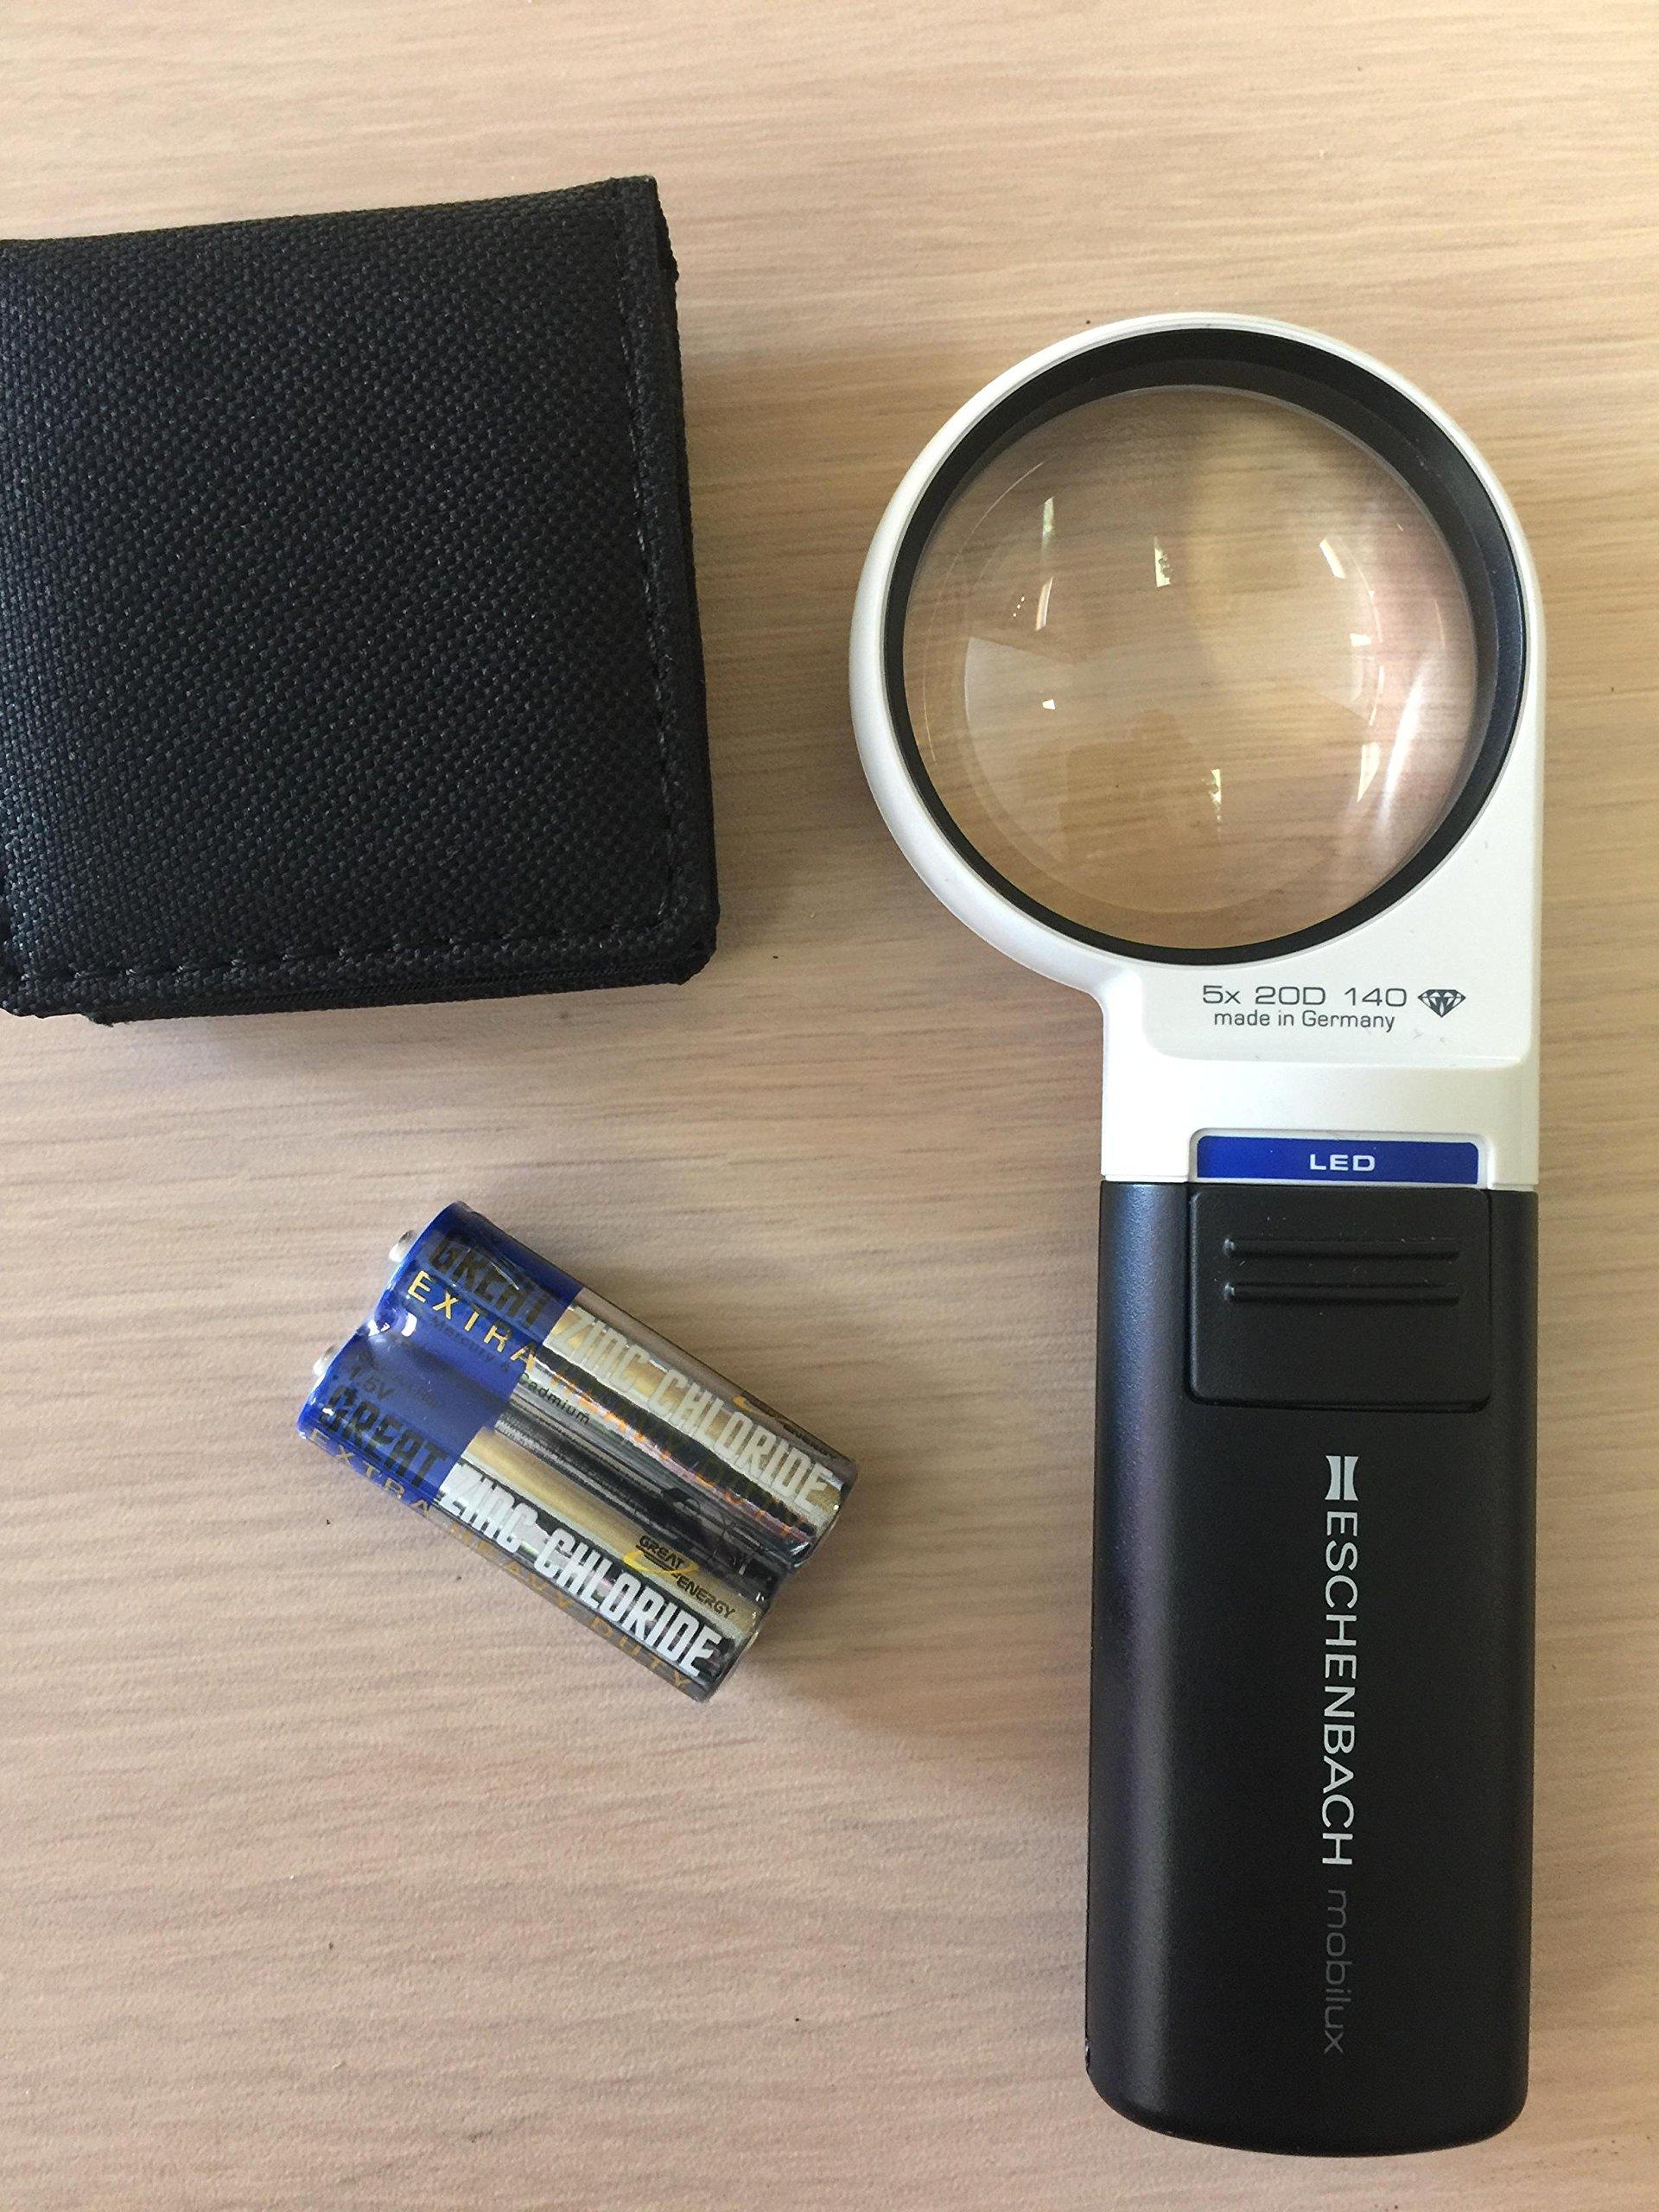 5X  LED illuminated hand held magnifier